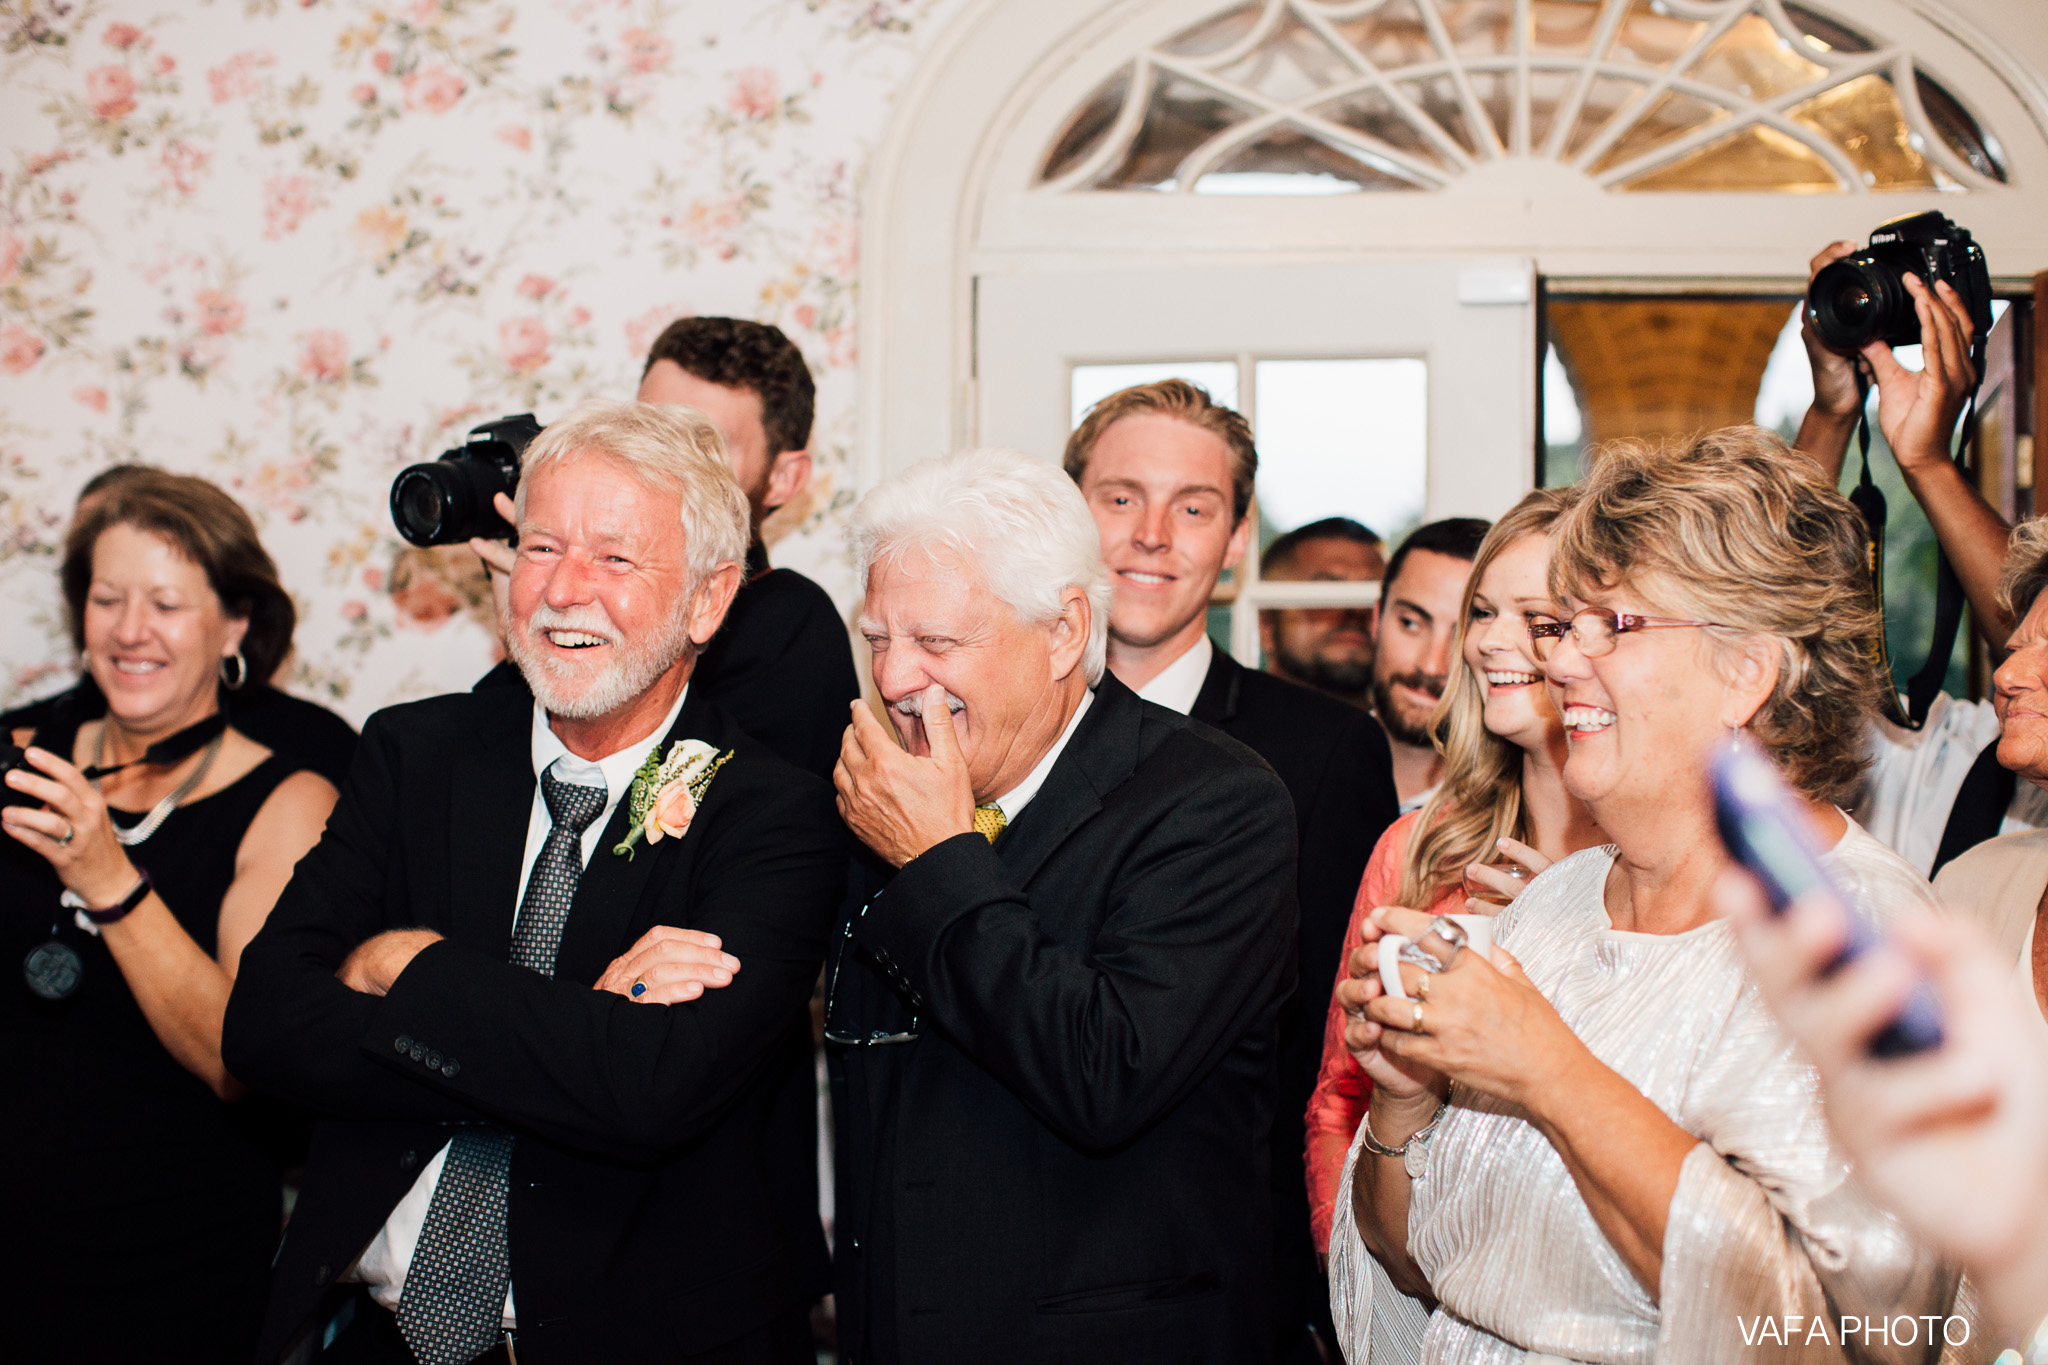 The-Felt-Estate-Wedding-Kailie-David-Vafa-Photo-1043.jpg